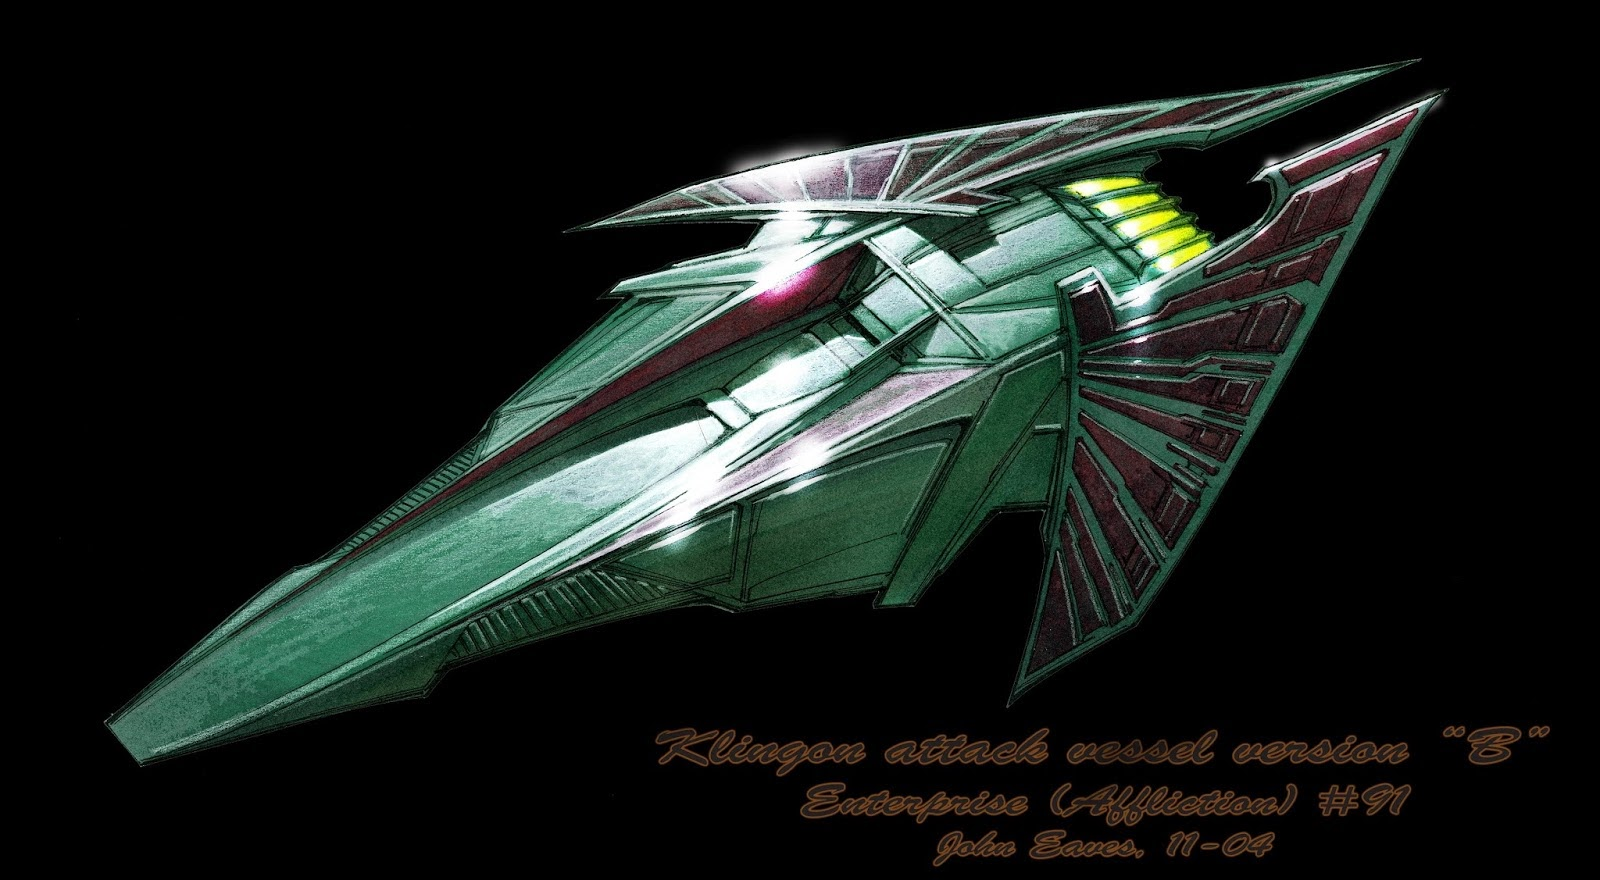 Guia de naves estelares: Diseños de naves klingons 2: Enterprise